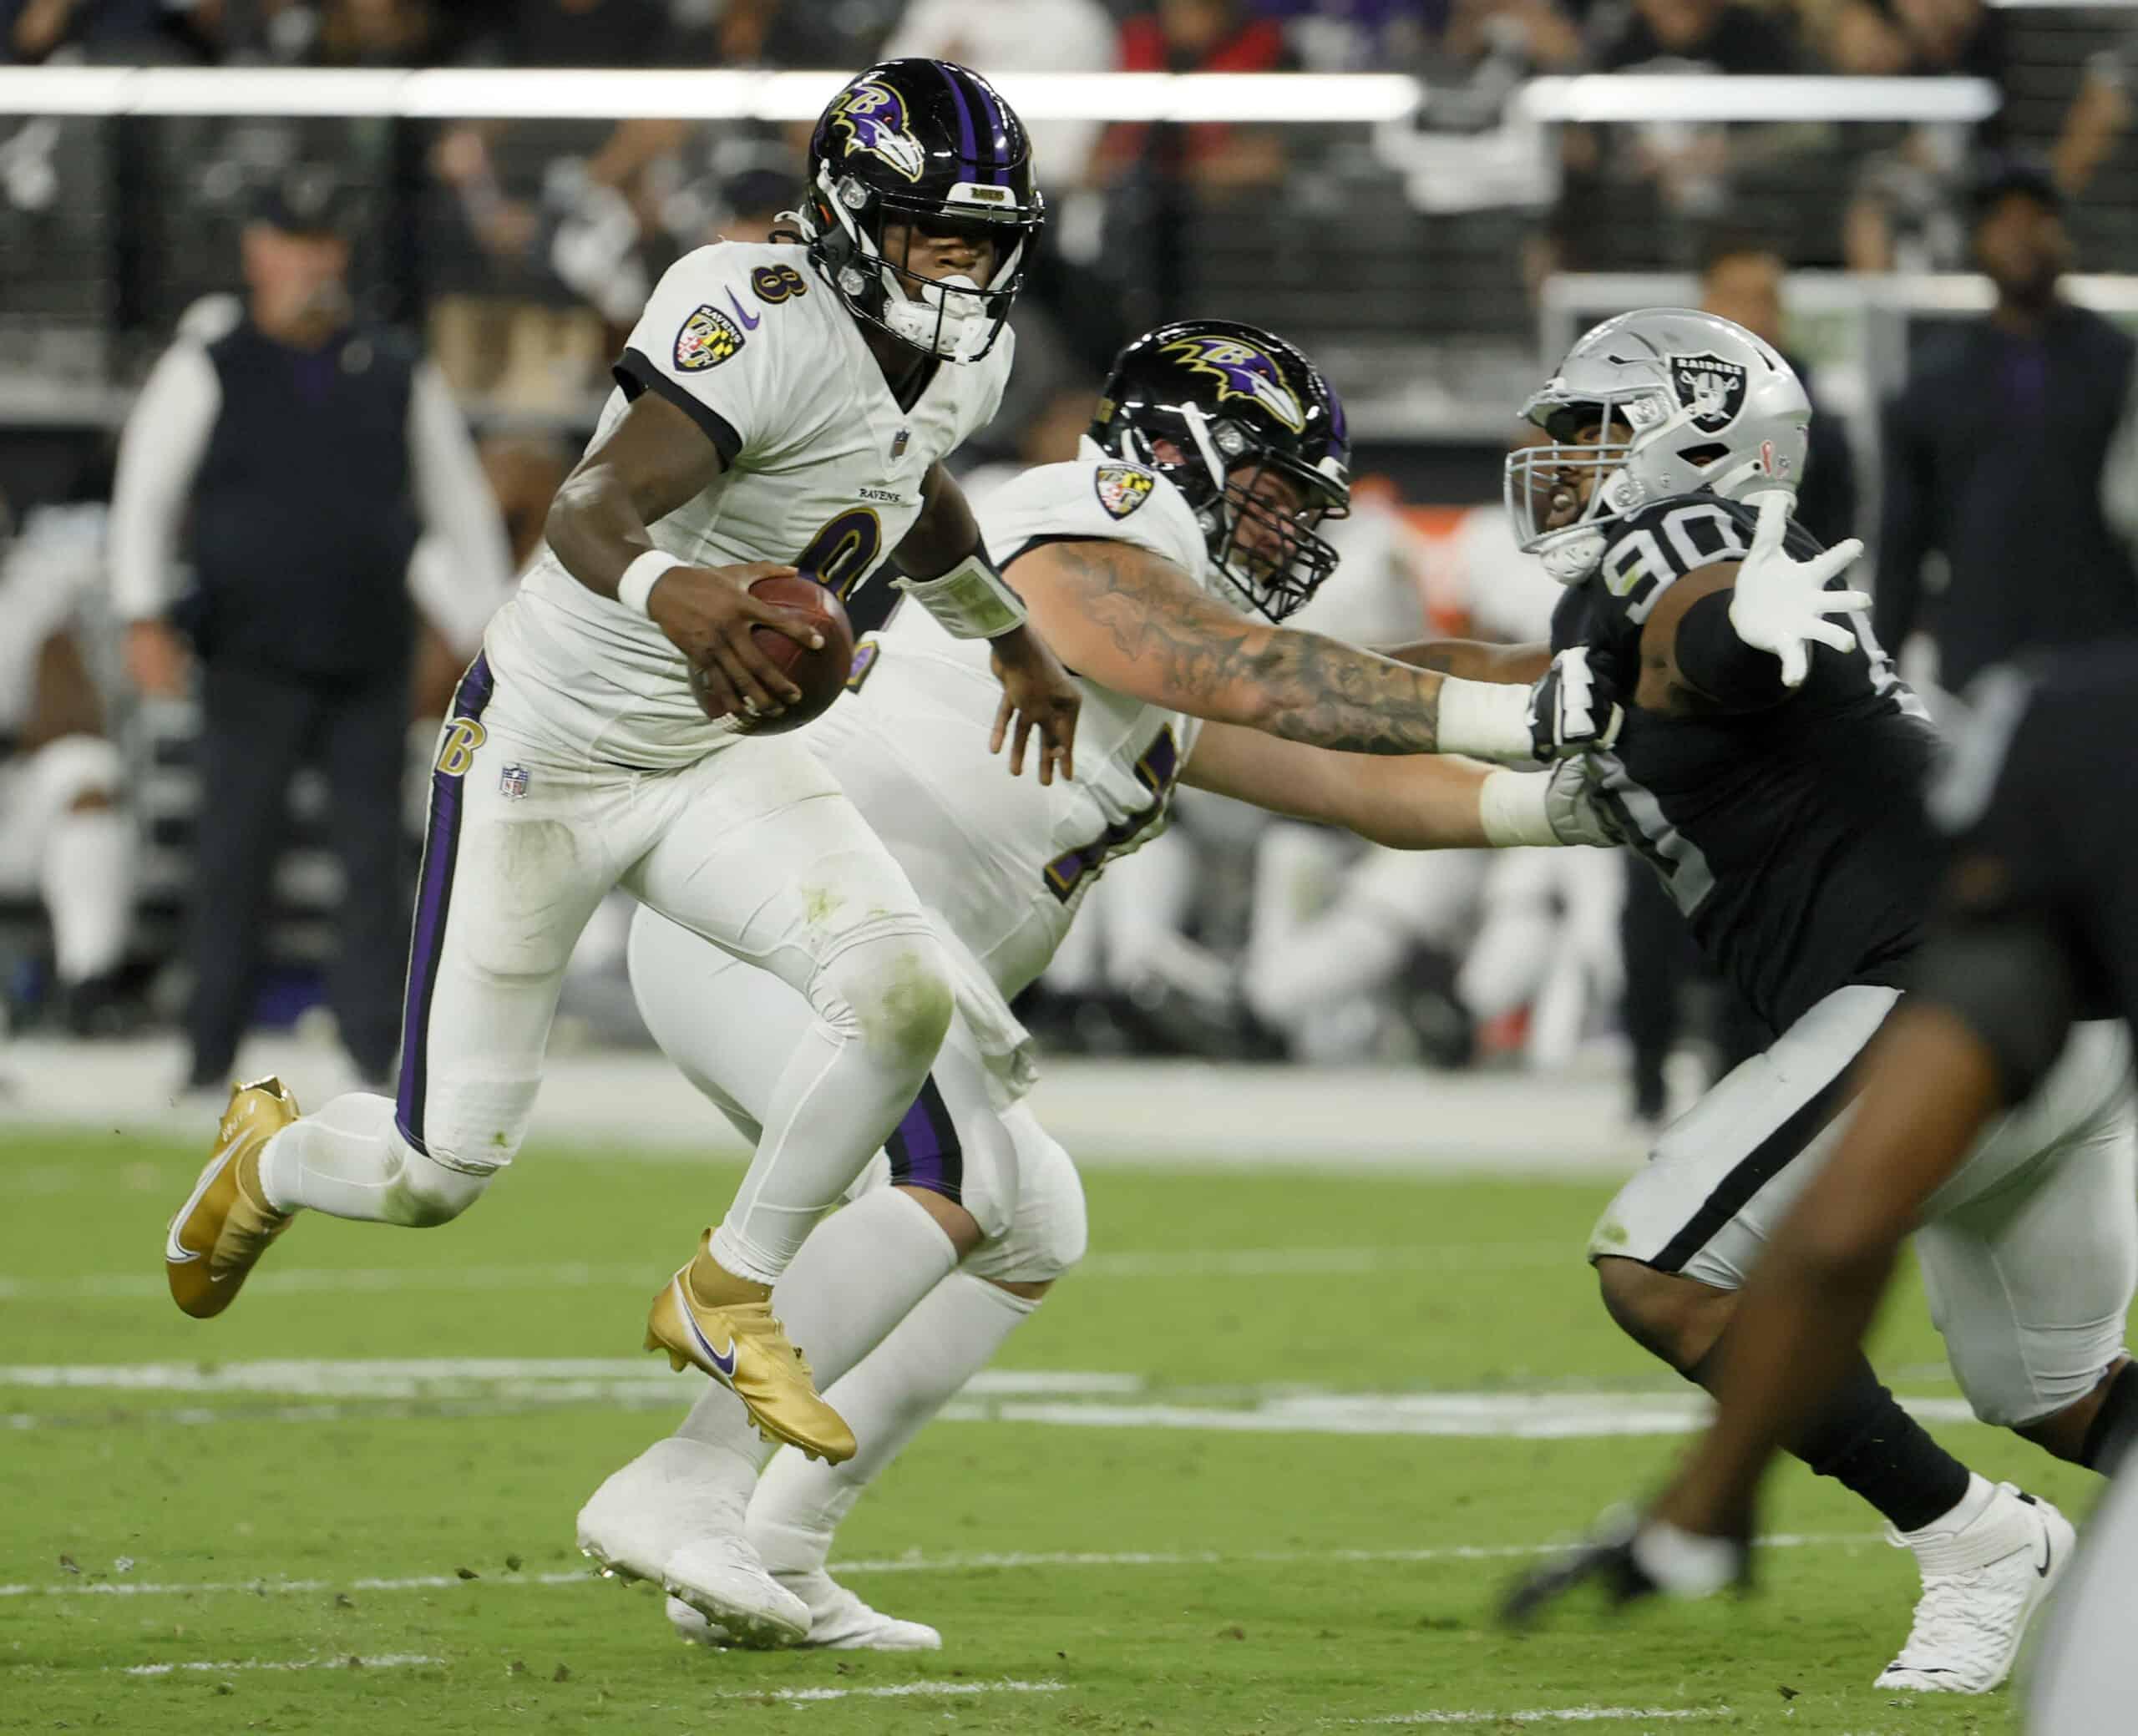 Quarterback Lamar Jackson #8 of the Baltimore Ravens runs against the Las Vegas Raiders during their game at Allegiant Stadium on September 13, 2021 in Las Vegas, Nevada. The Raiders defeated the Ravens 33-27 in overtime.